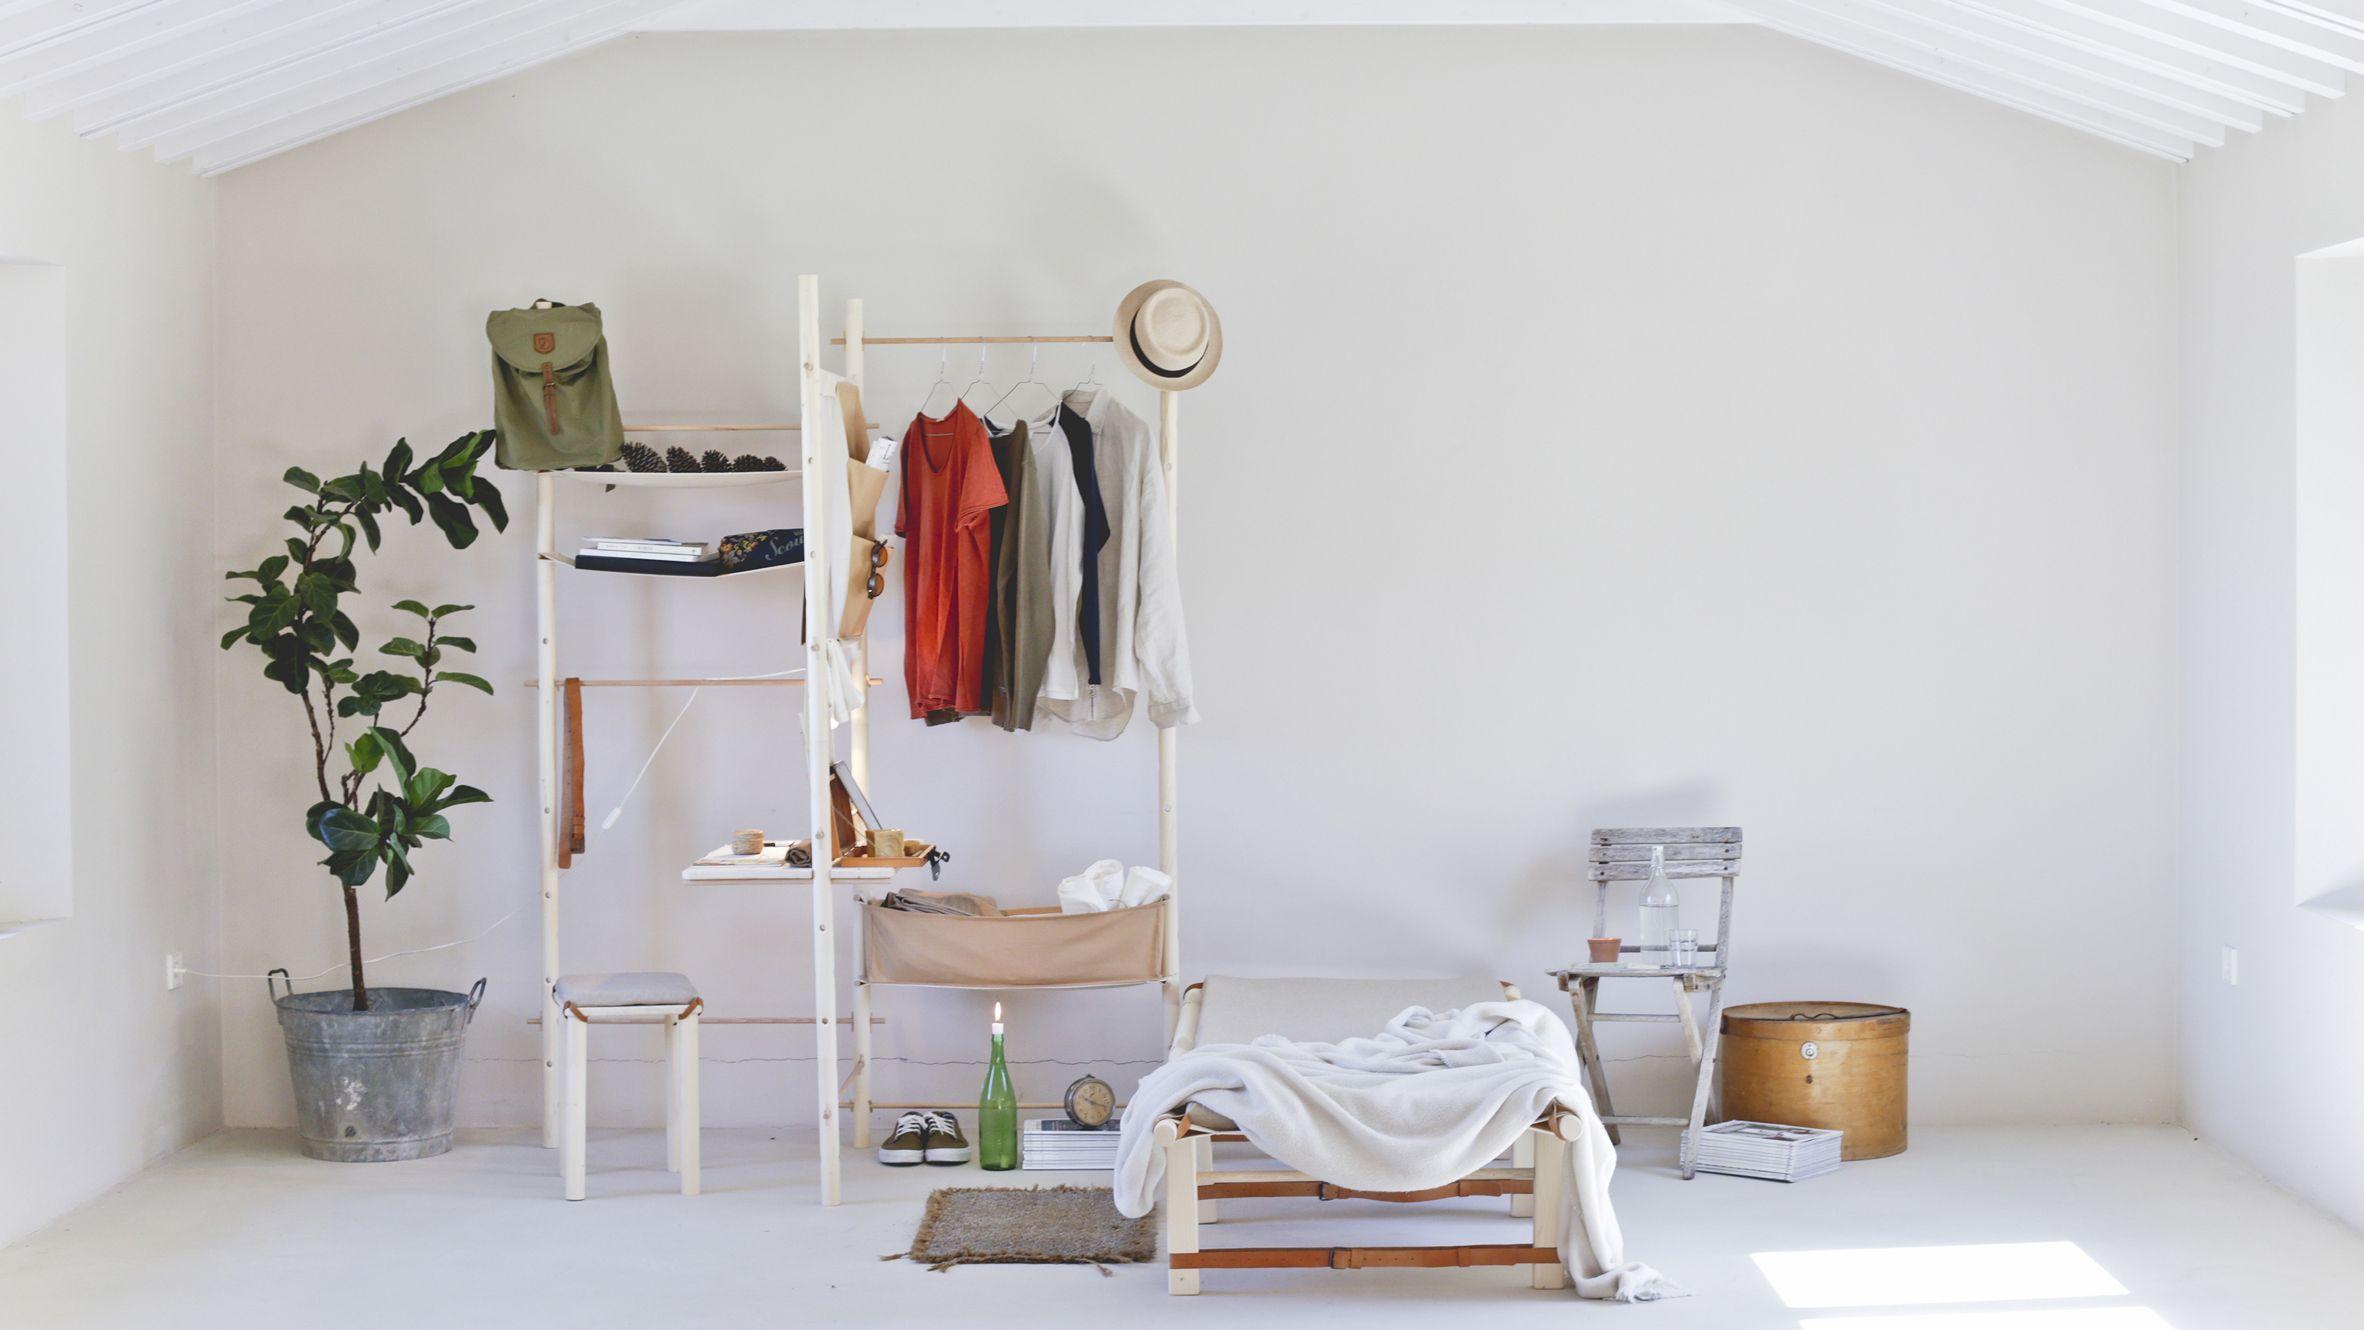 Italian Designer Elena Bompani Has Designed A Flexible Furniture System  Called Itaca Thatu0027s Tailored To Renters